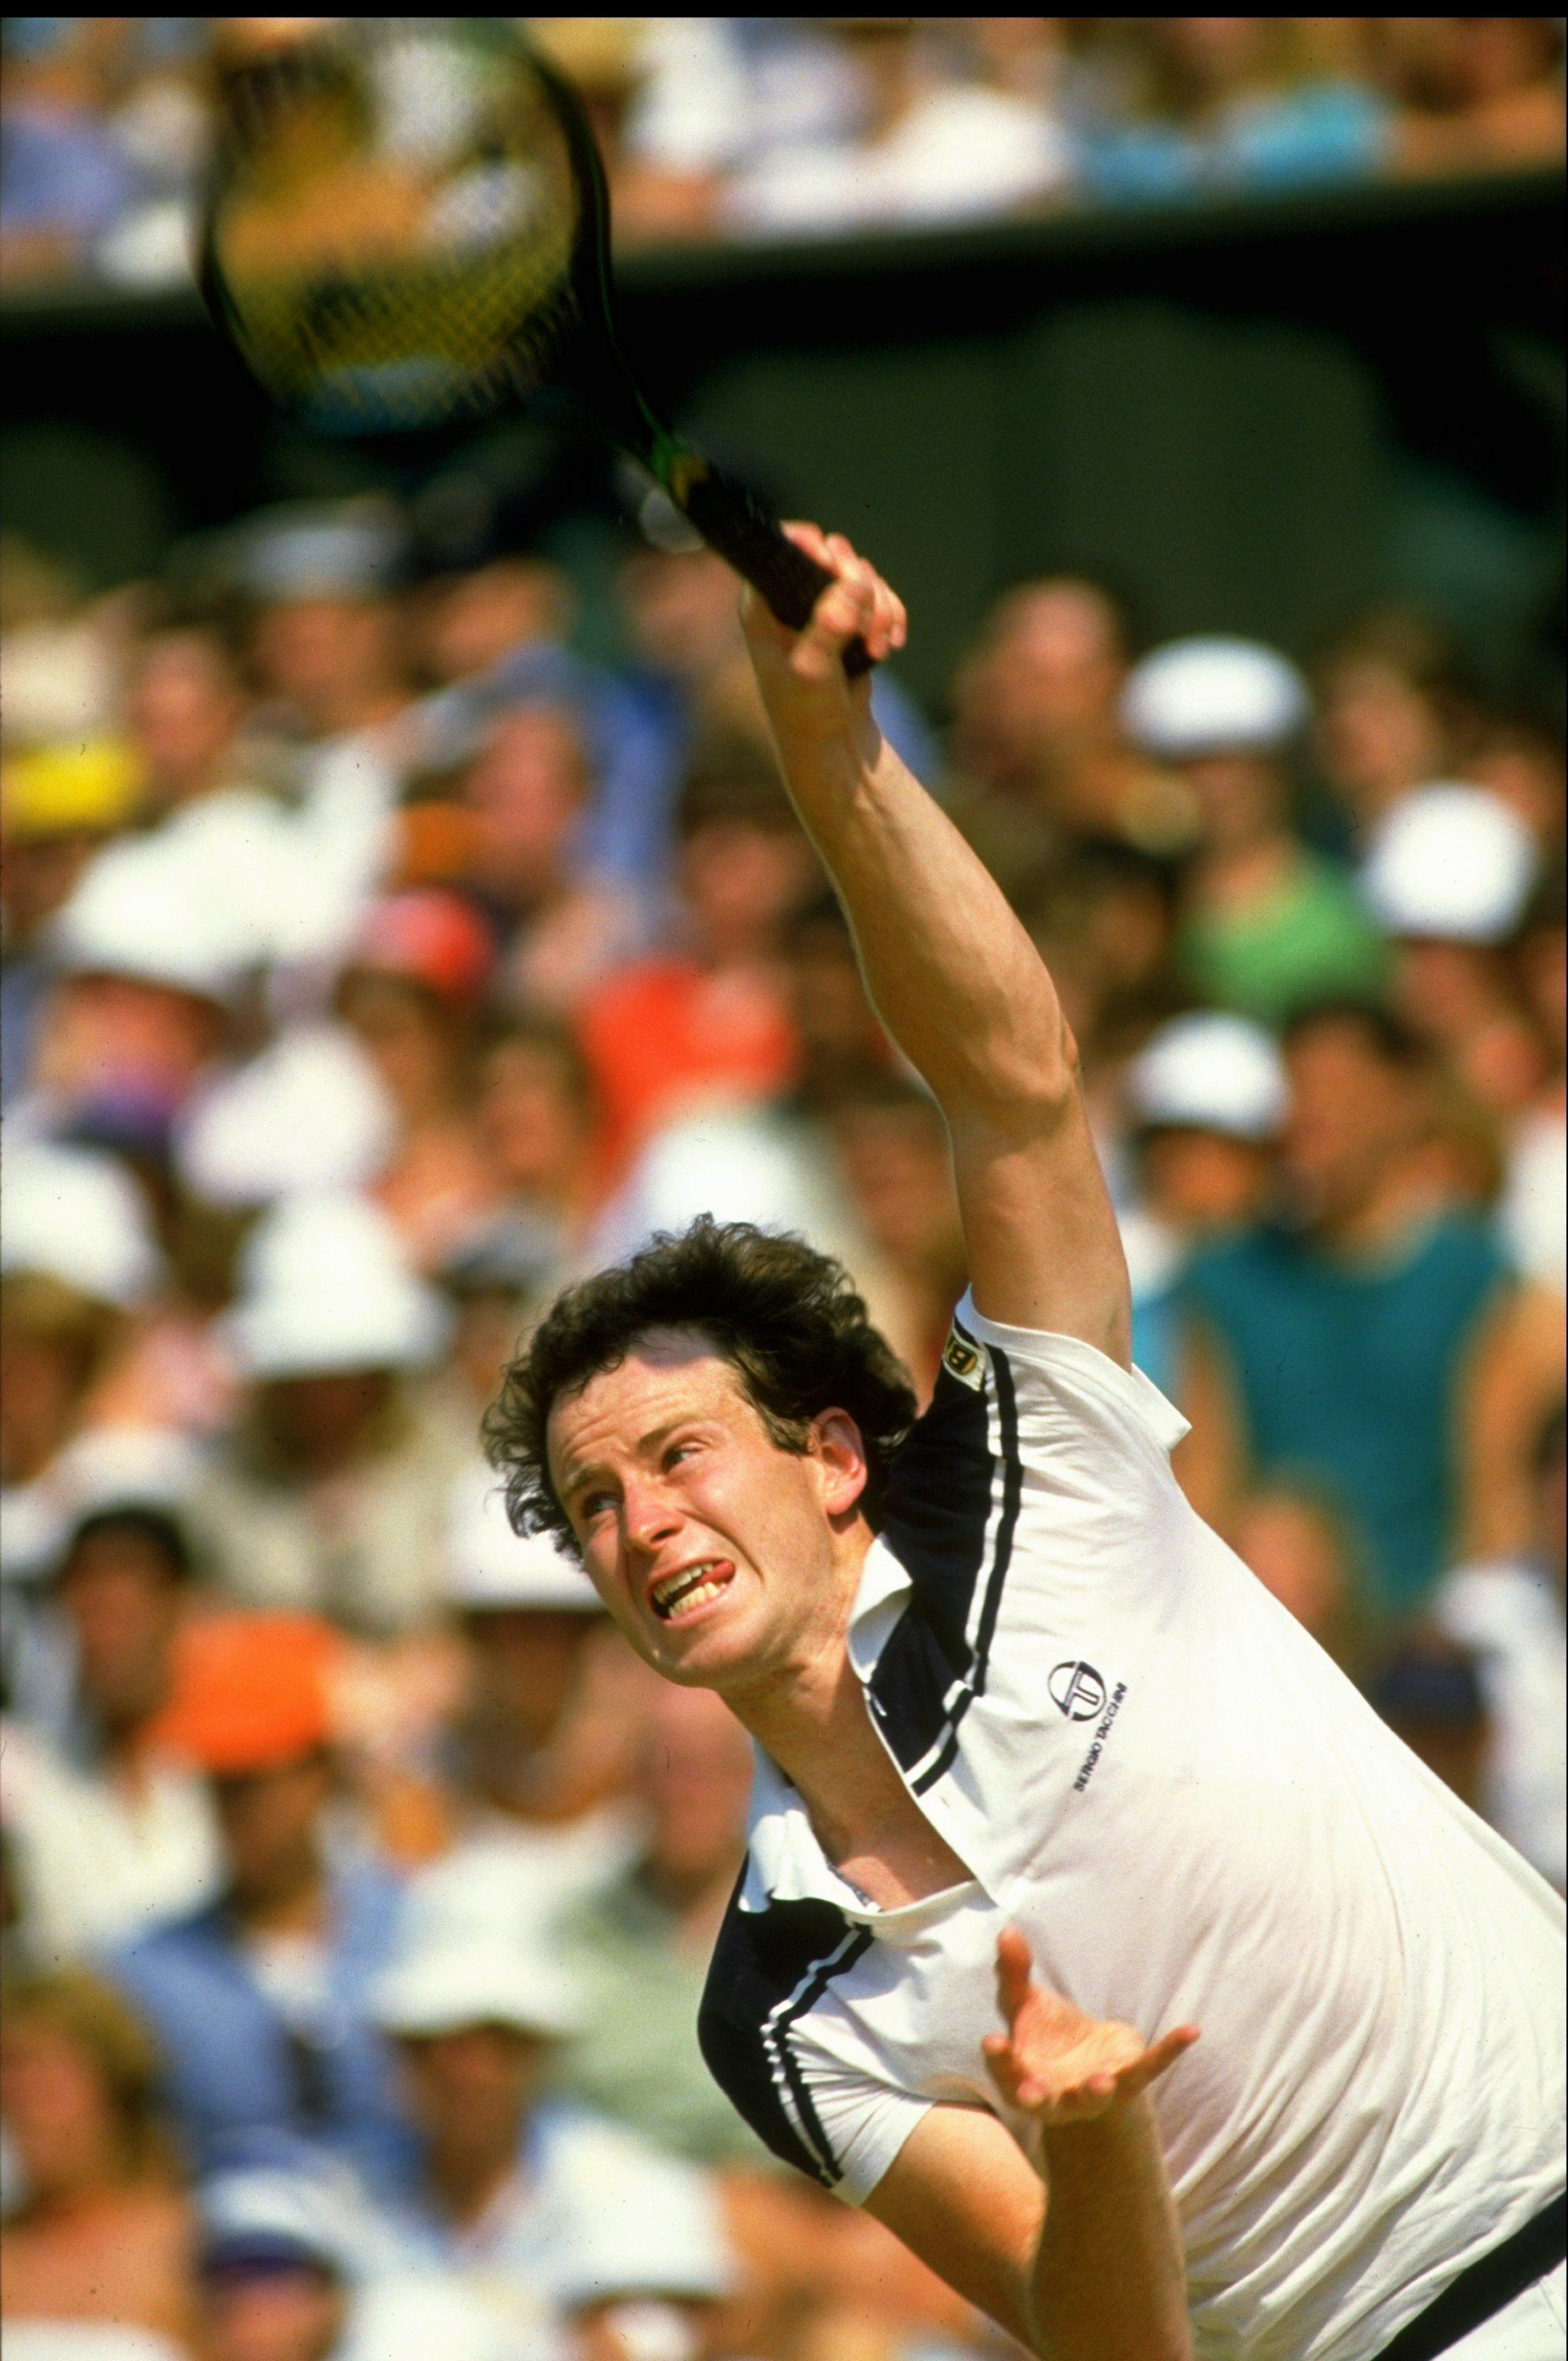 Jun-Jul 1984:  John McEnroe of the USA in action during the Lawn Tennis Championships at Wimbledon in London. \ Mandatory Credit: Allsport UK /Allsport